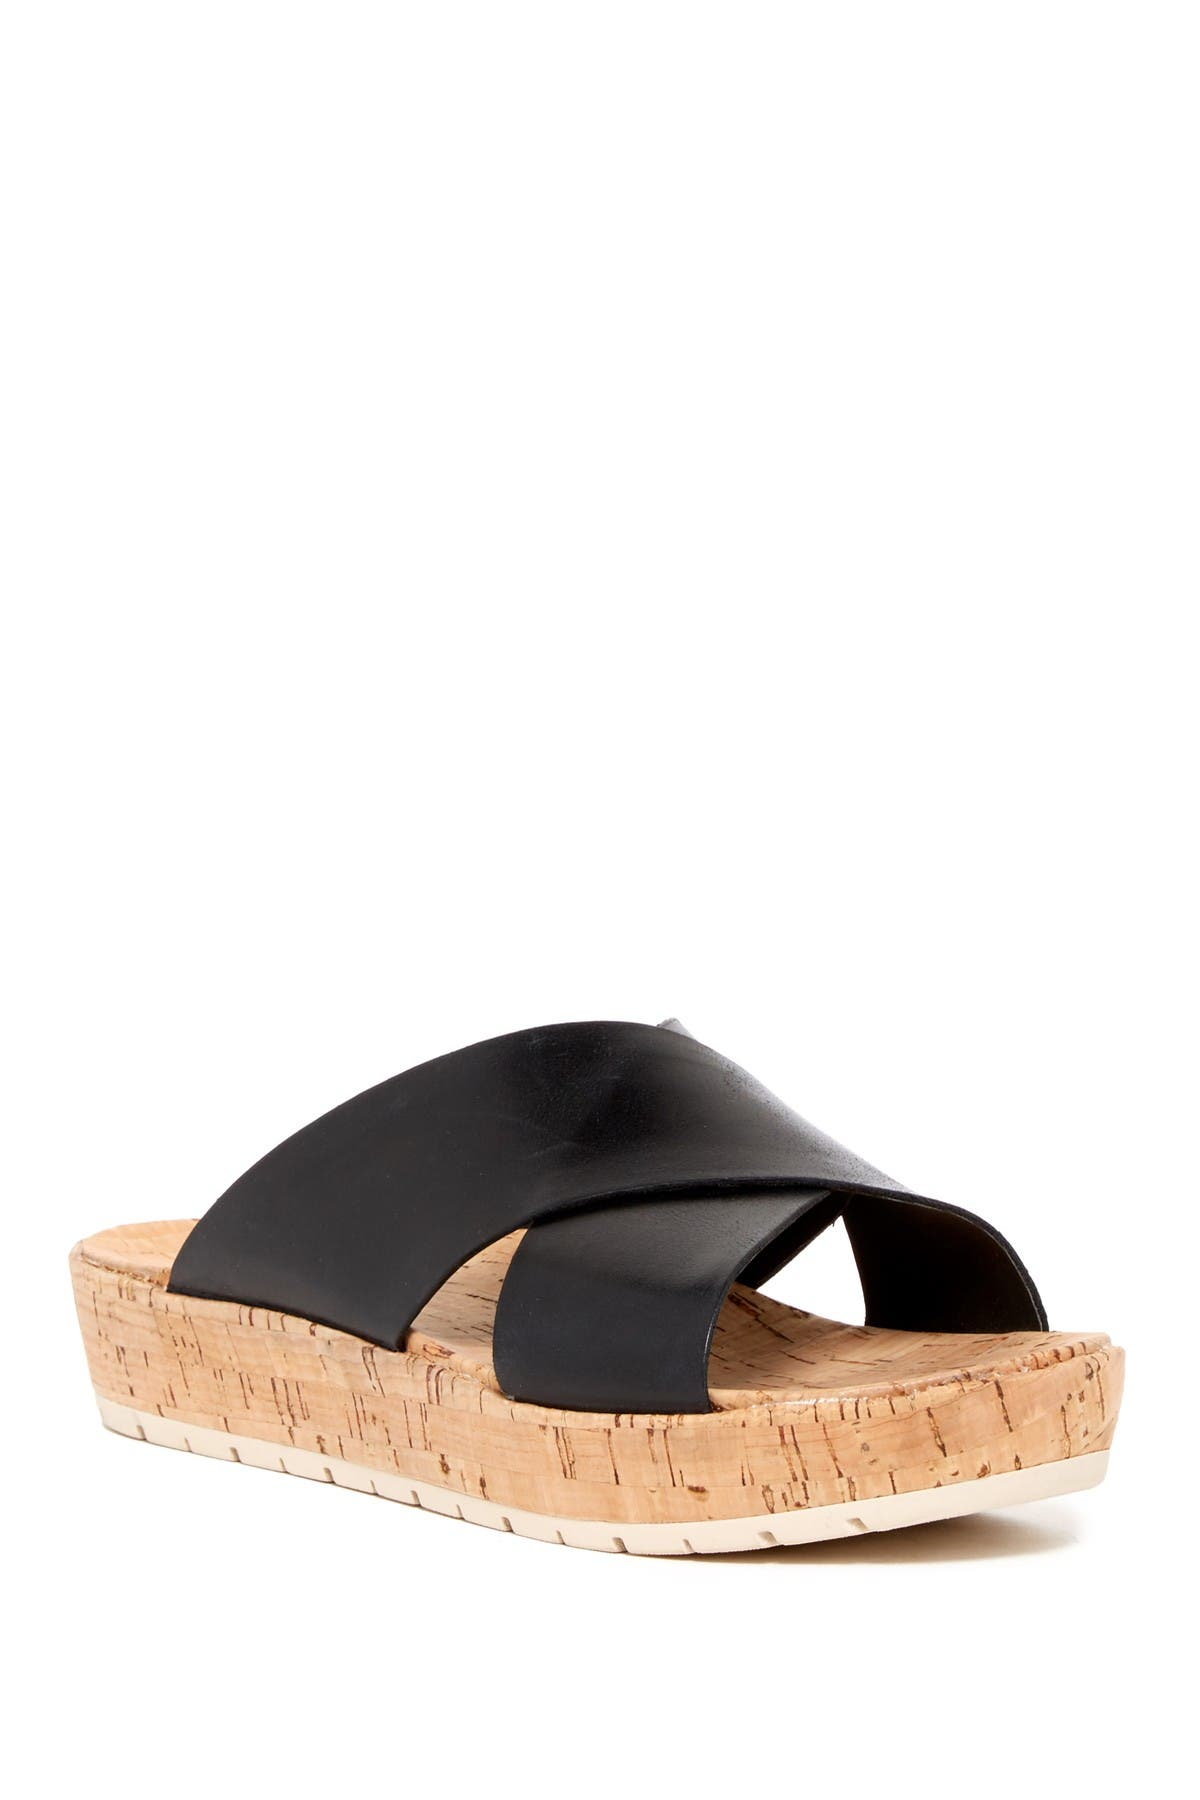 Image of Kork-Ease Joly Slide Sandal